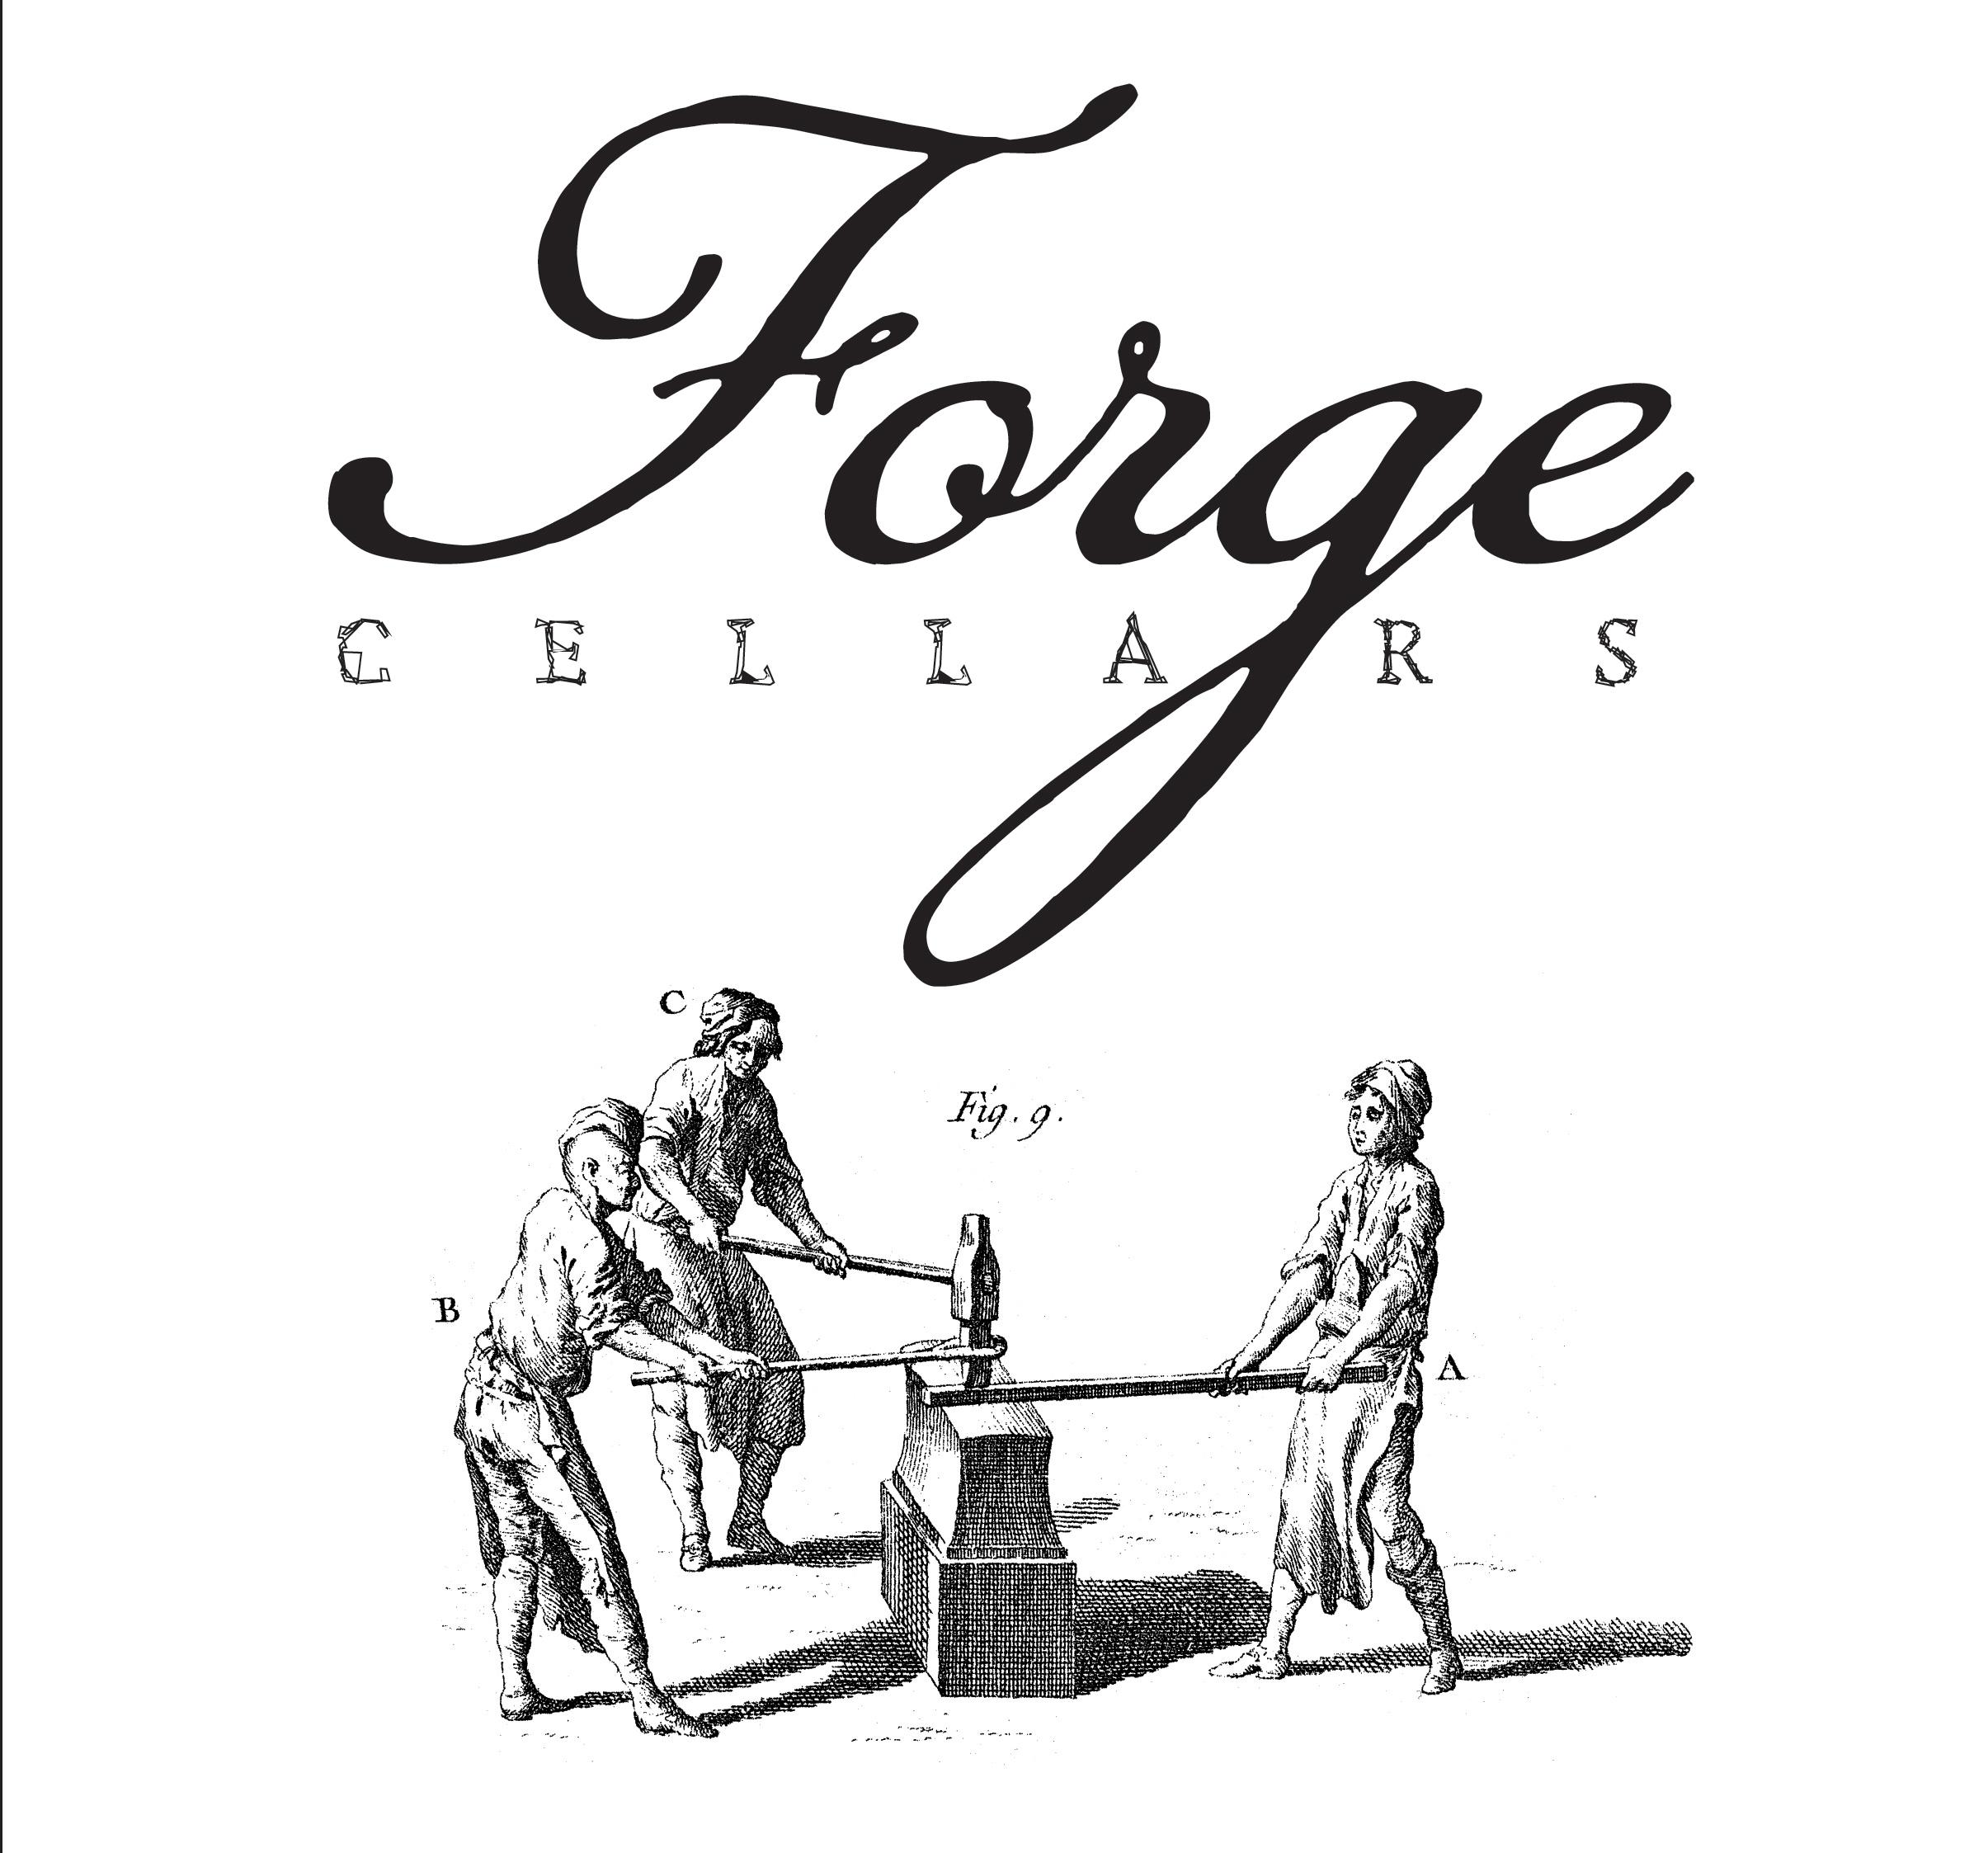 ForgeCellarsFullLogo.png